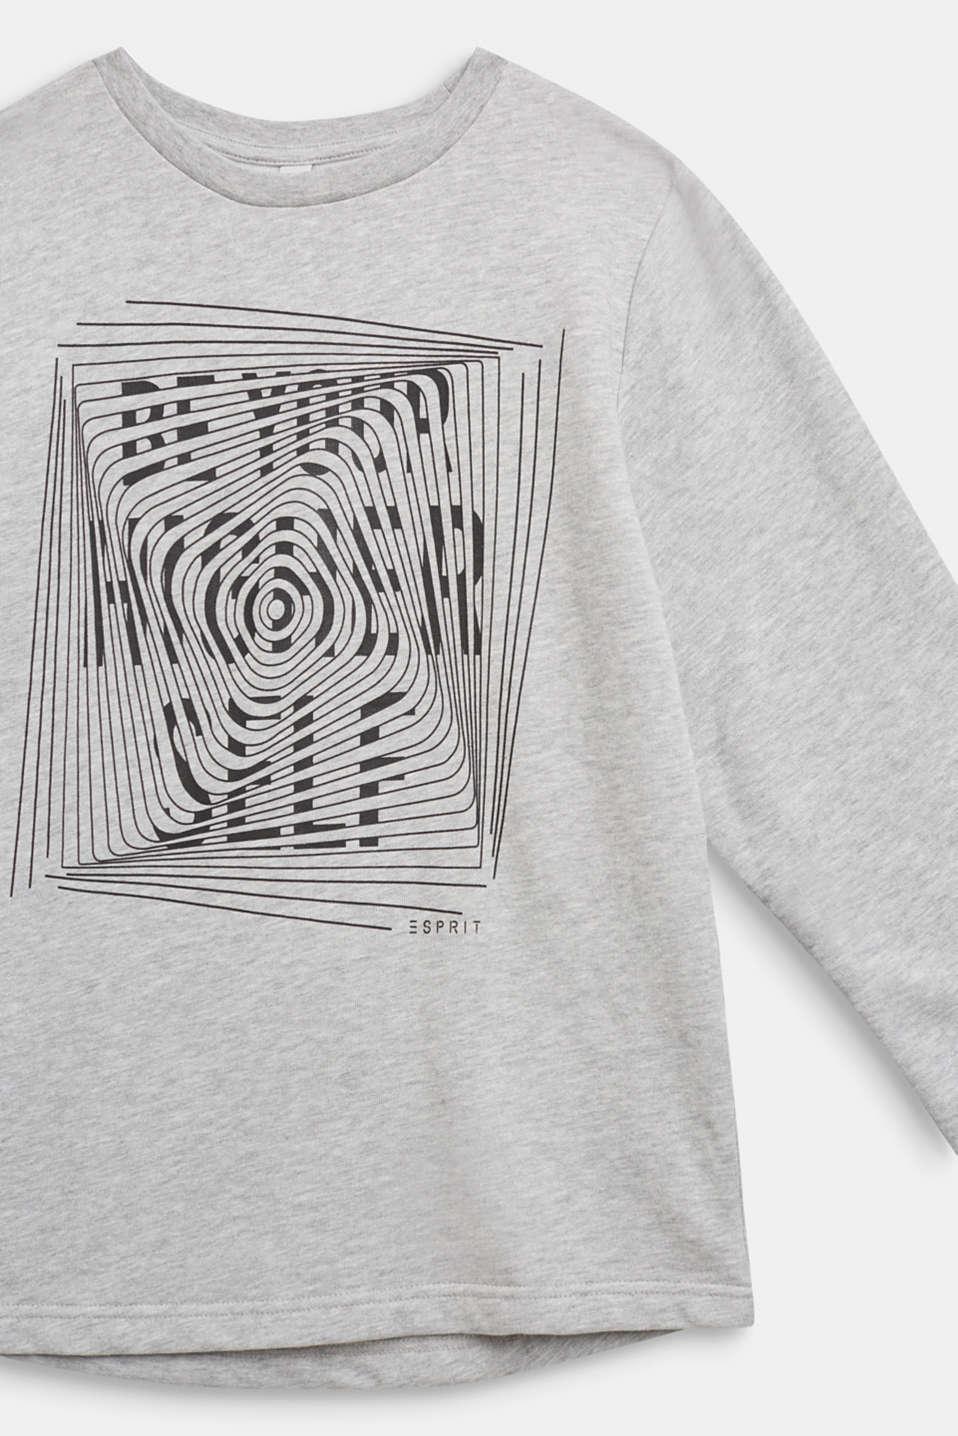 Statement print sweatshirt, LCHEATHER SILVER, detail image number 2